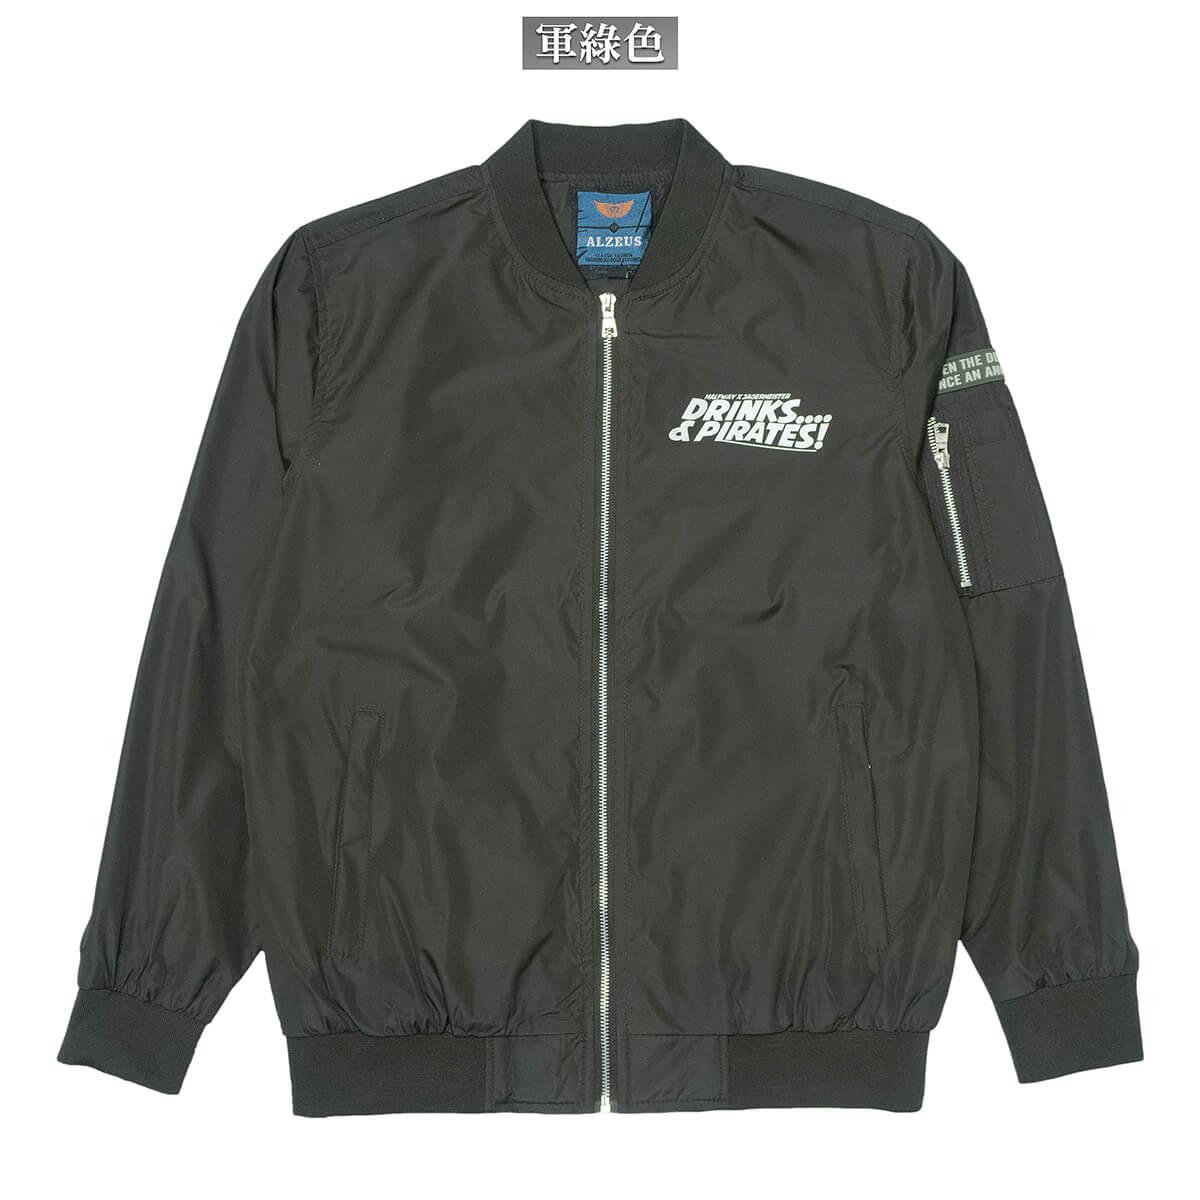 MA-1飛行外套 飛行夾克 空軍外套 防風外套 潮流時尚休閒外套 立領外套 黑色外套 MA-1 Flight Jacket Men's Jackets Casual Jackets (321-889-01)軍綠色、(321-889-02)黑色 M L XL (胸圍114~124公分  45~49英吋) 男 [實體店面保障] sun-e 1